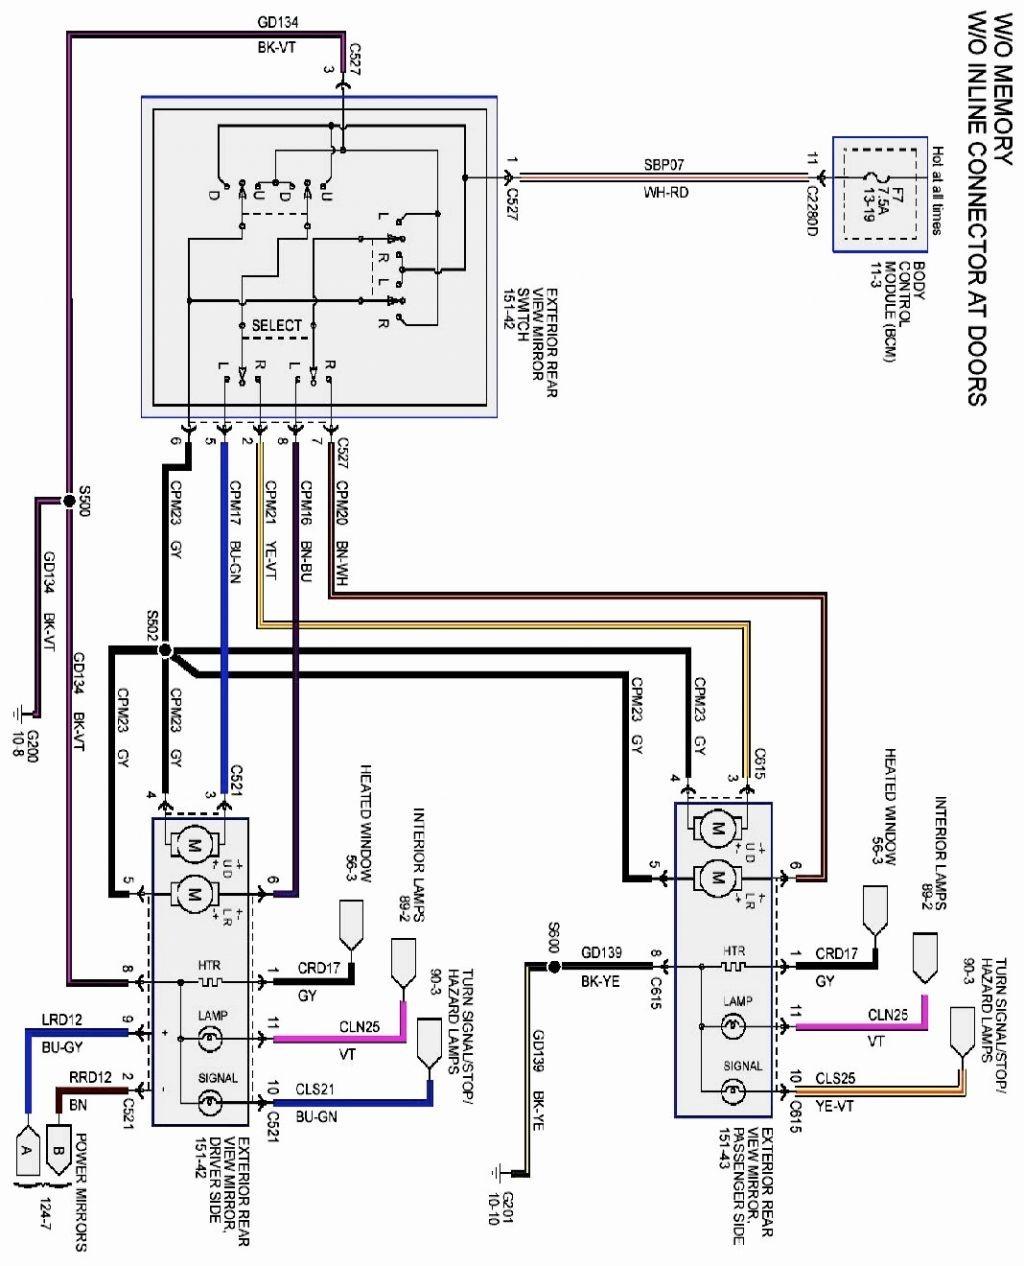 vrcd400 sdu wiring diagram 2 2006 f150 headlight power mirror switch new image